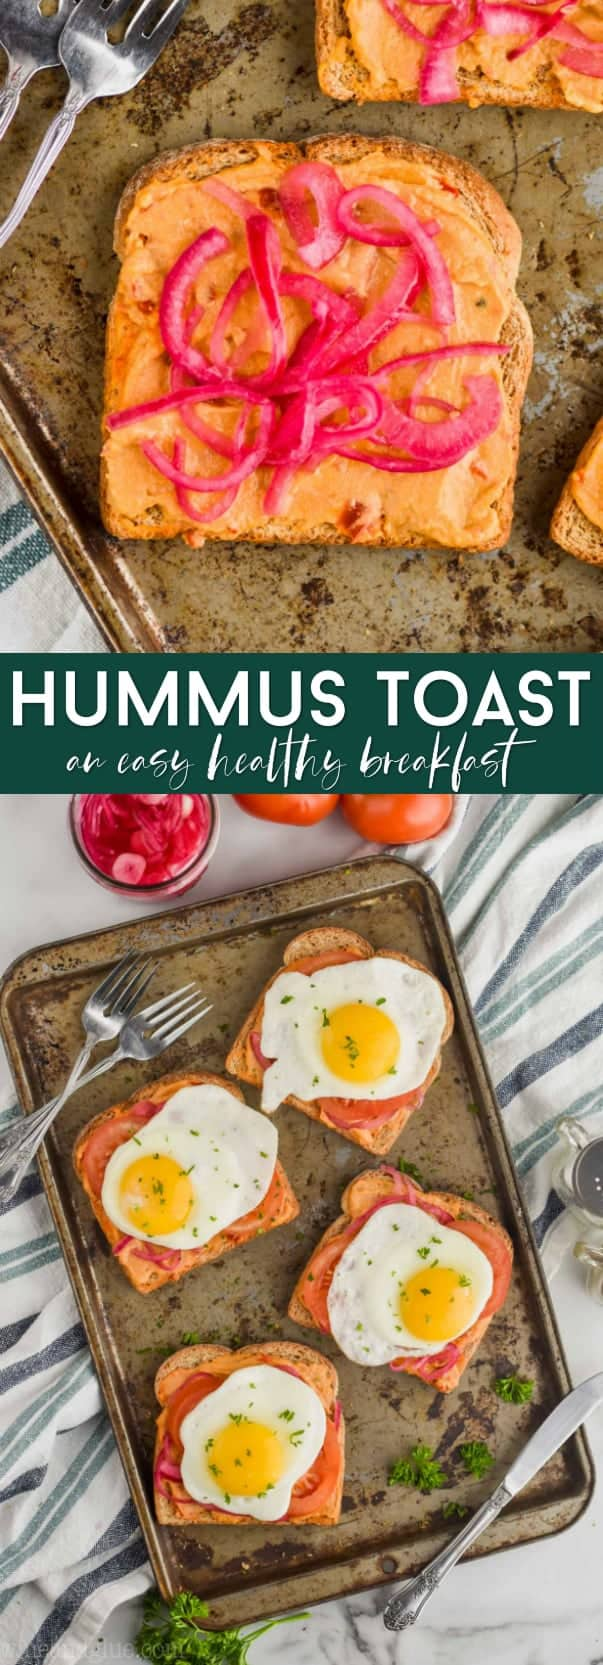 collage of hummus toast recipe